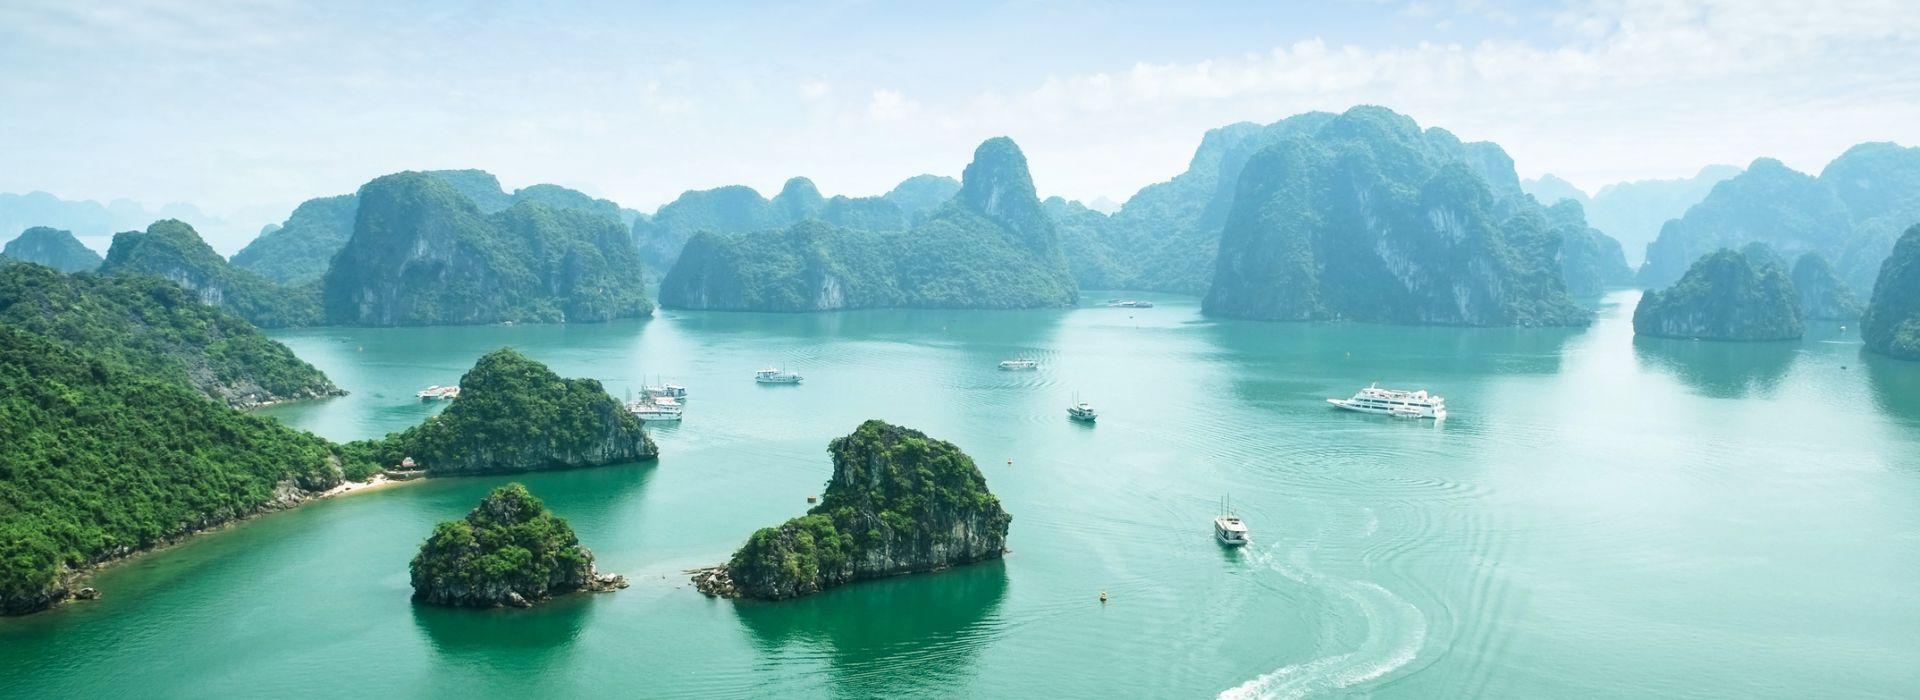 Natural landmarks sightseeing Tours in Mekong Delta